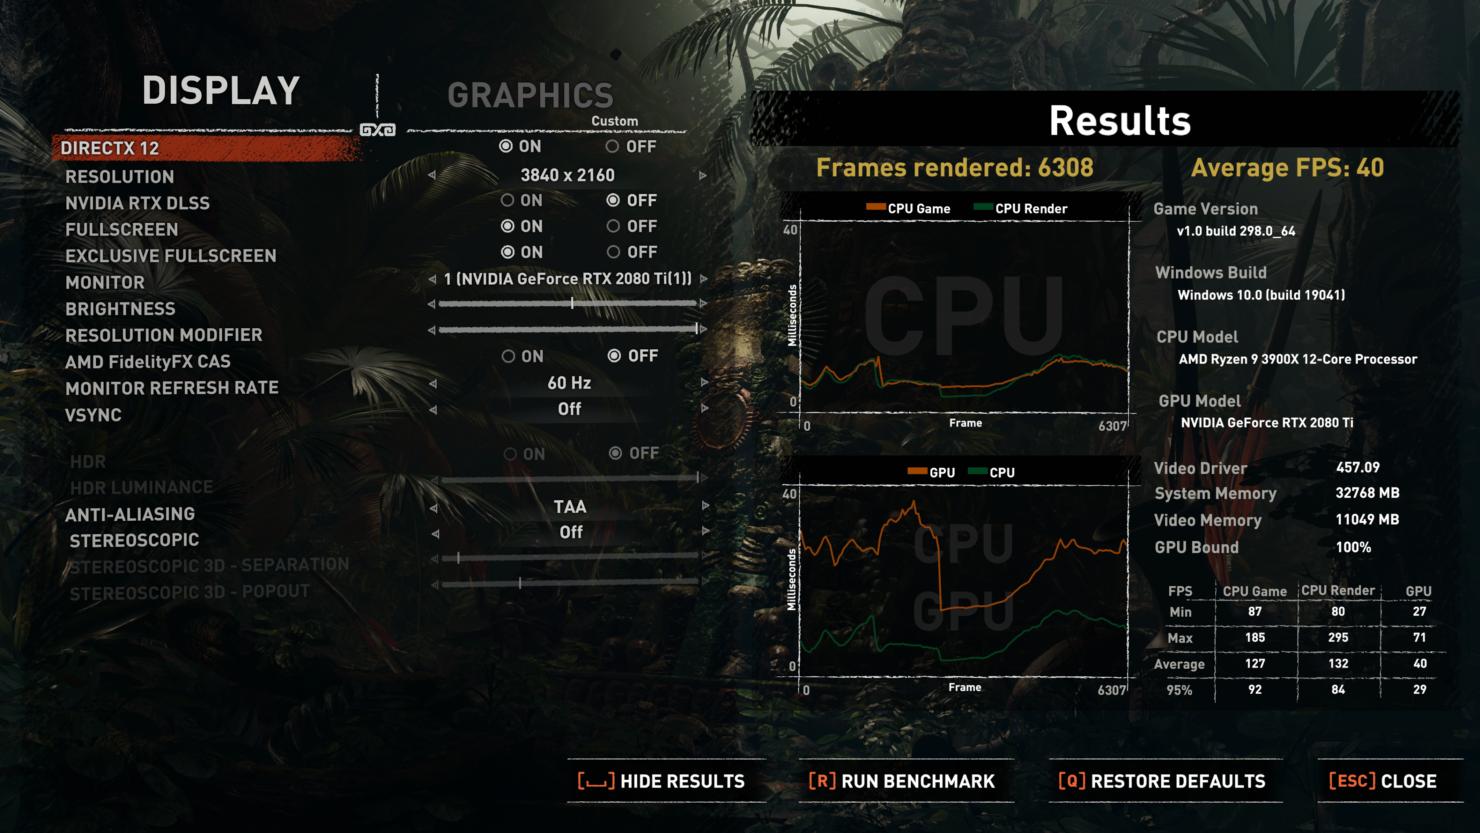 nvidia-geforce-rtx-2080-ti-raytracing-benchmark_4k